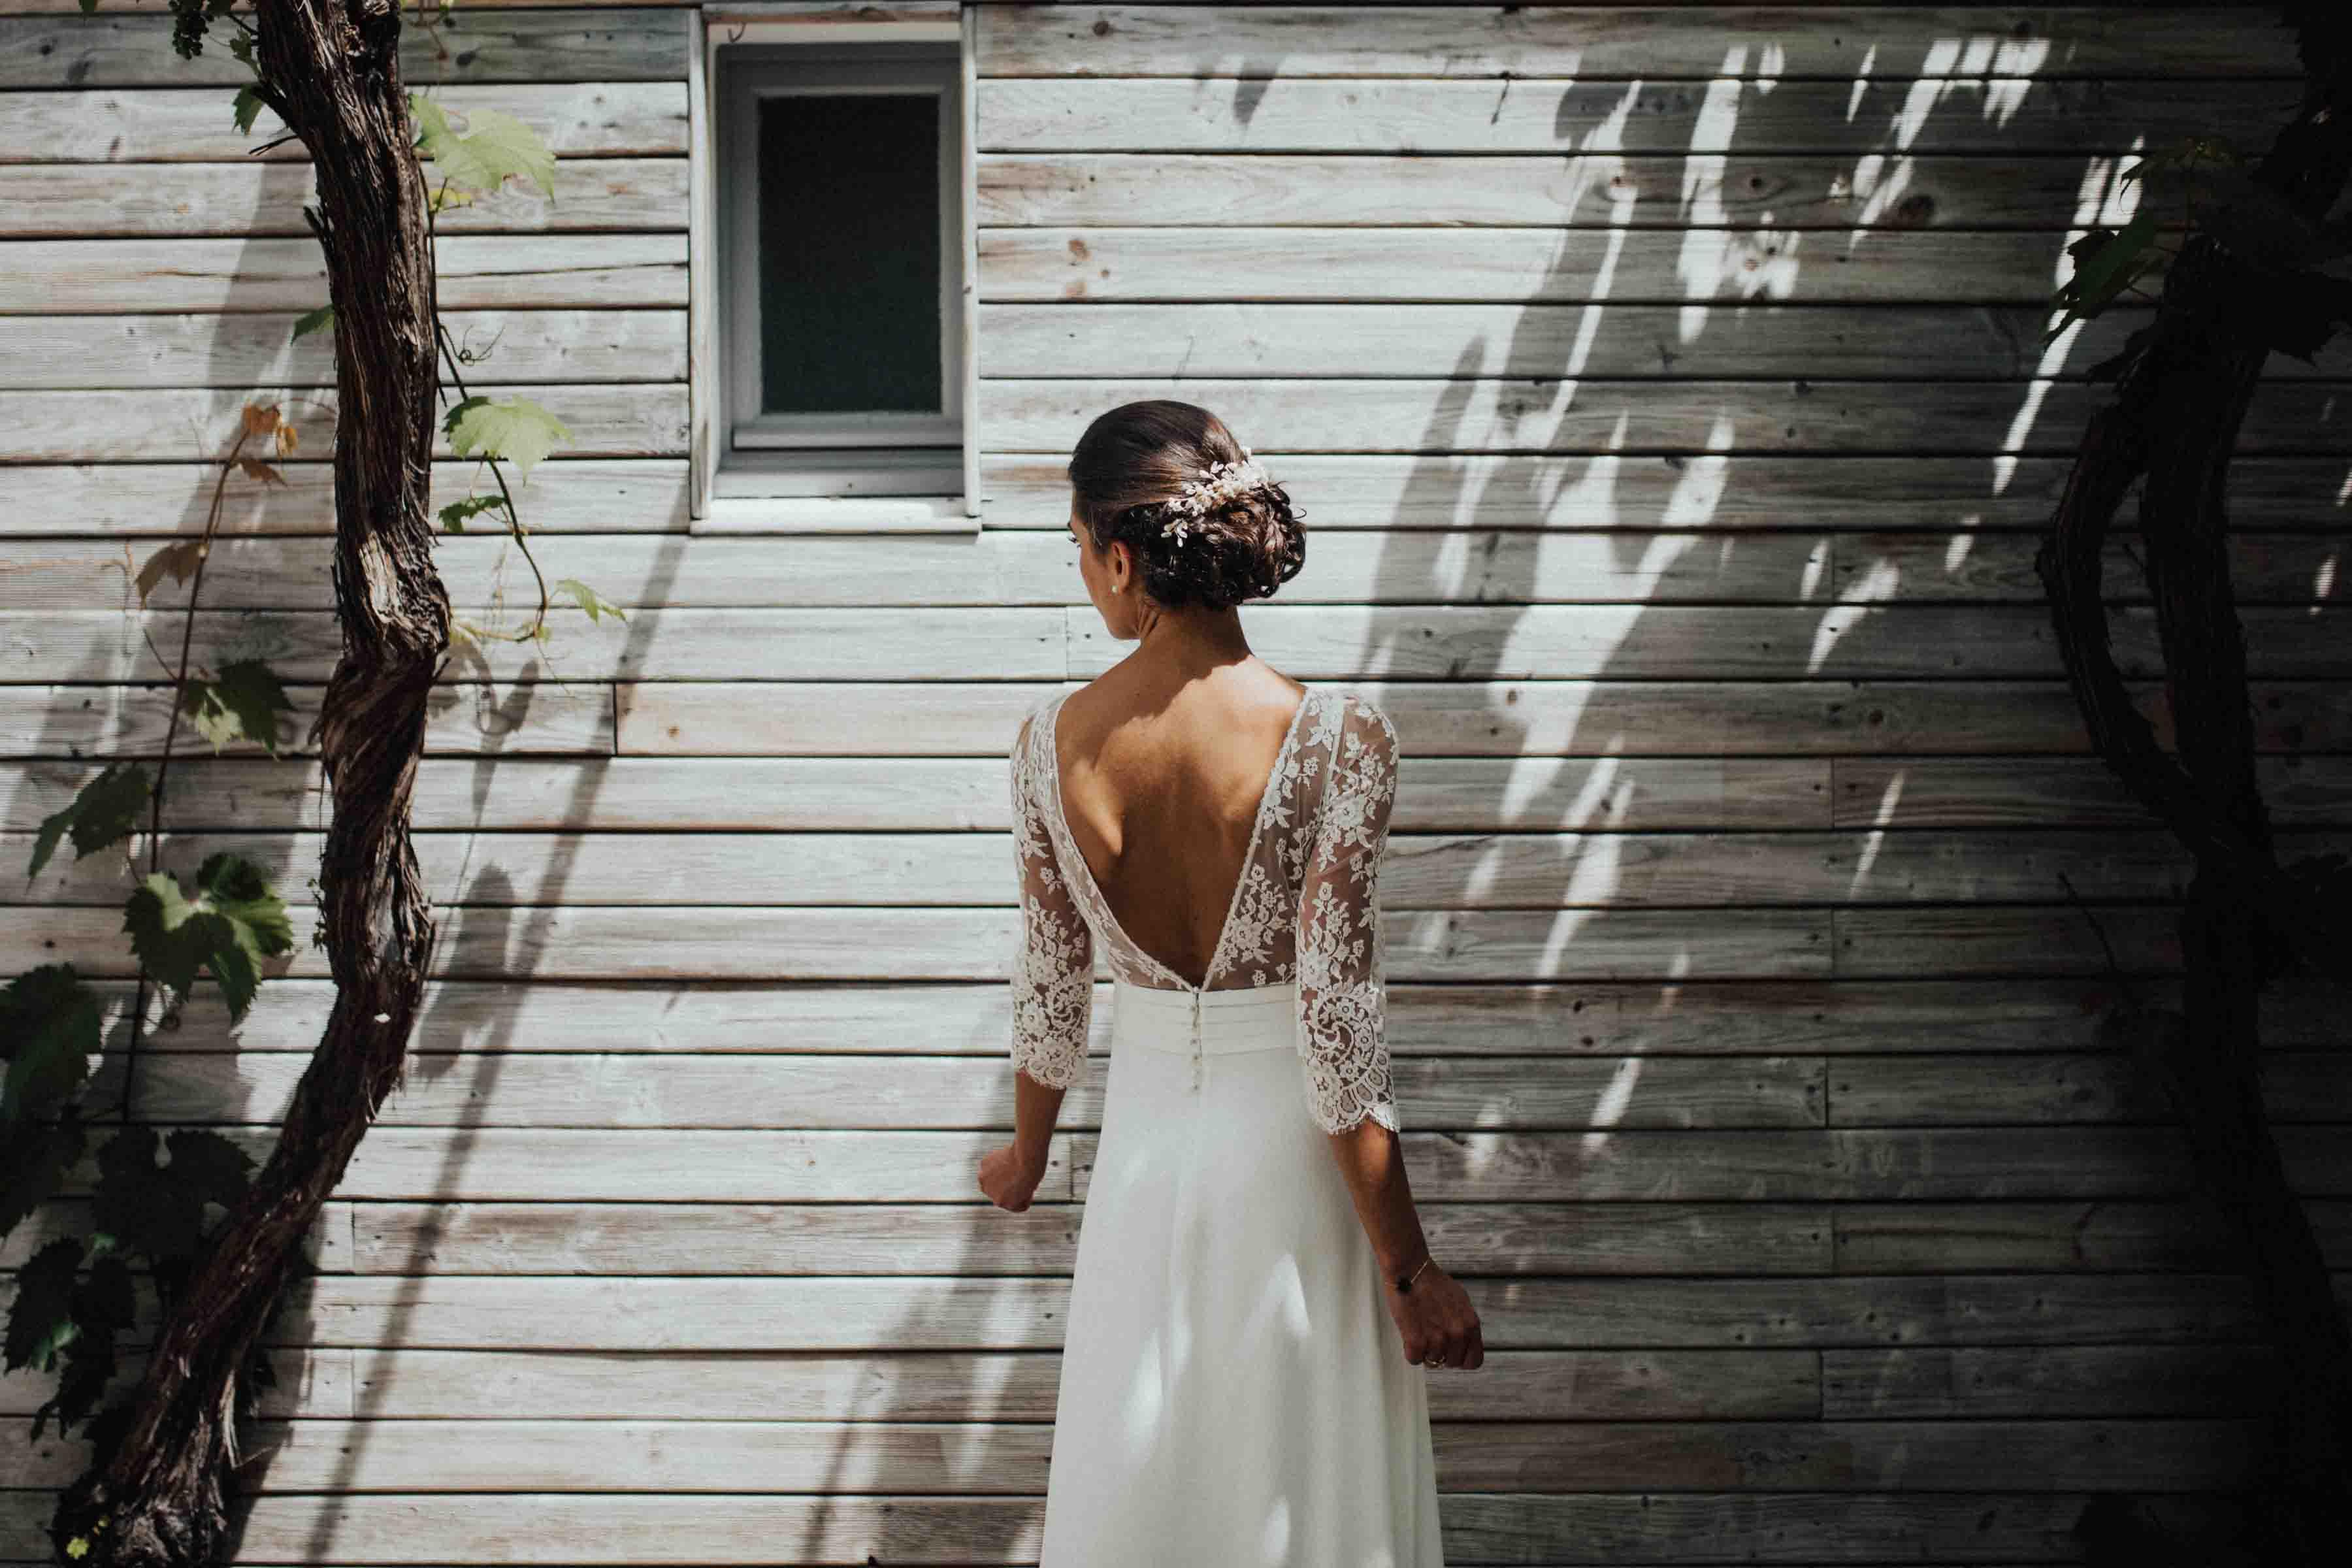 mariage ile de re robe Laure de Sagazan